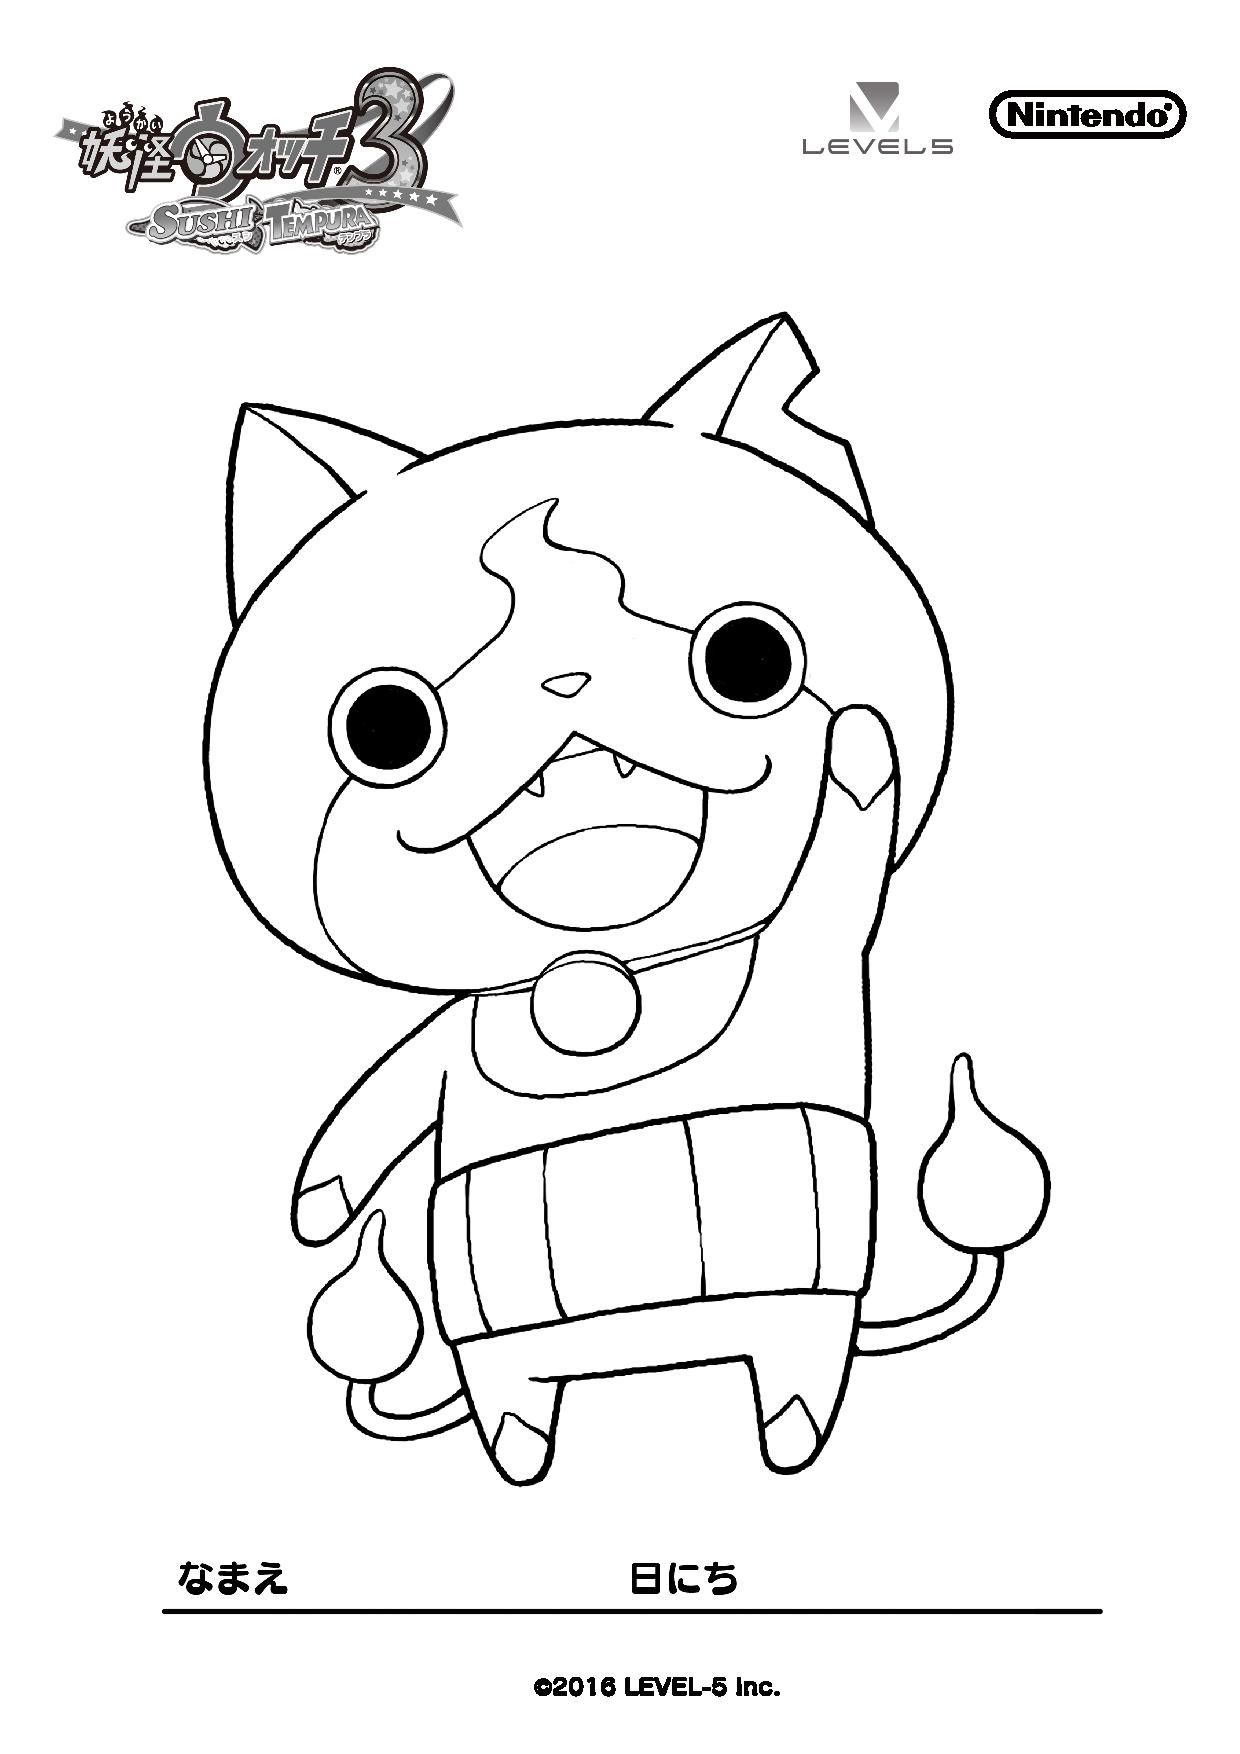 Inspirant Dessin à Imprimer Pokemon Gratuit